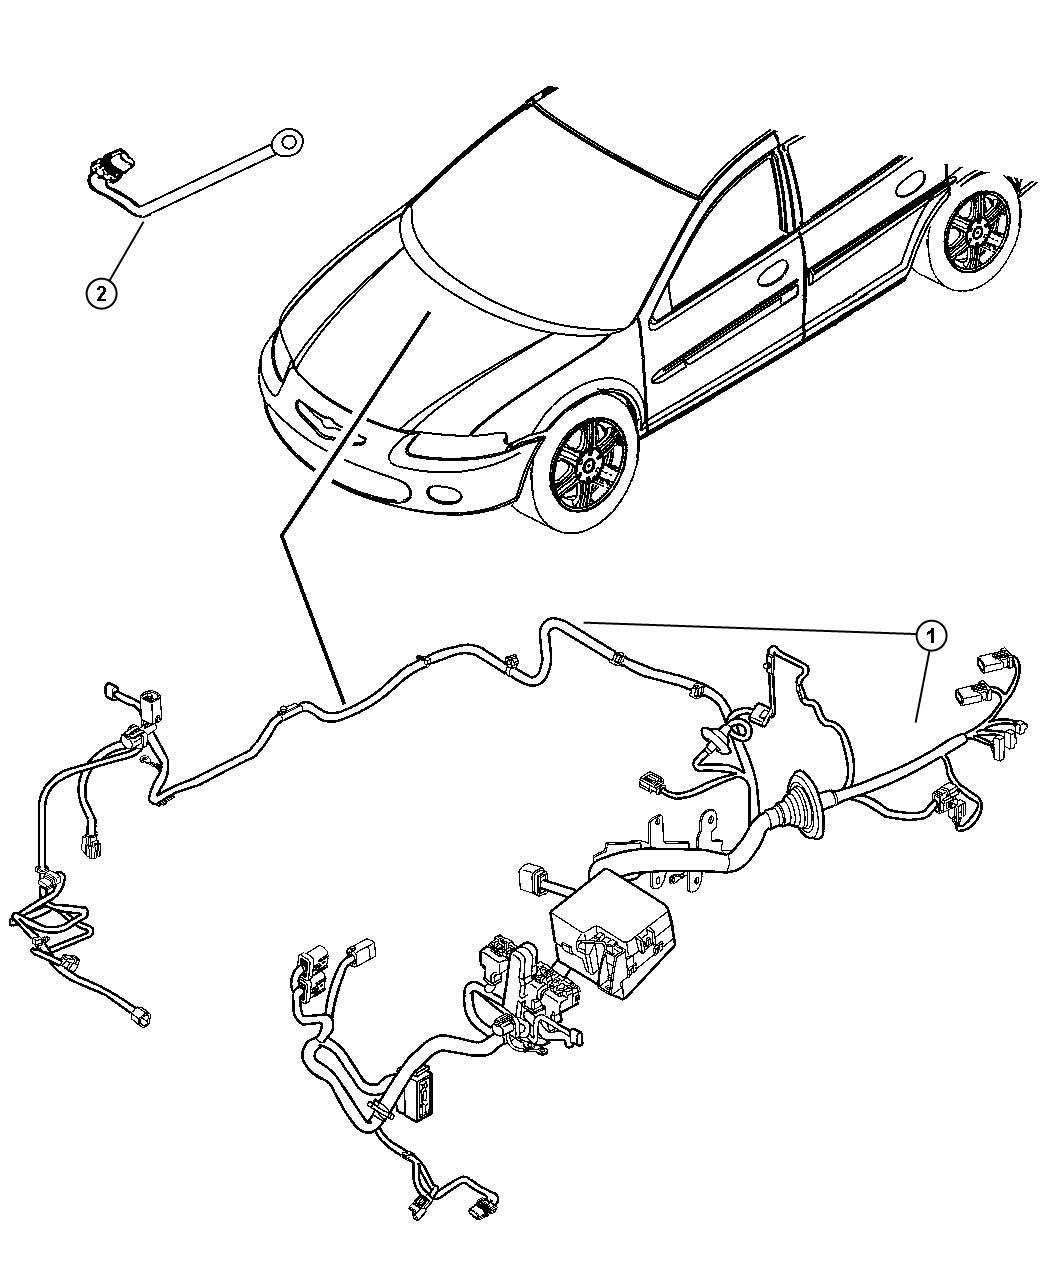 Dodge Avenger Wiring. Jumper. Cooling fan. Mopar, headlamp